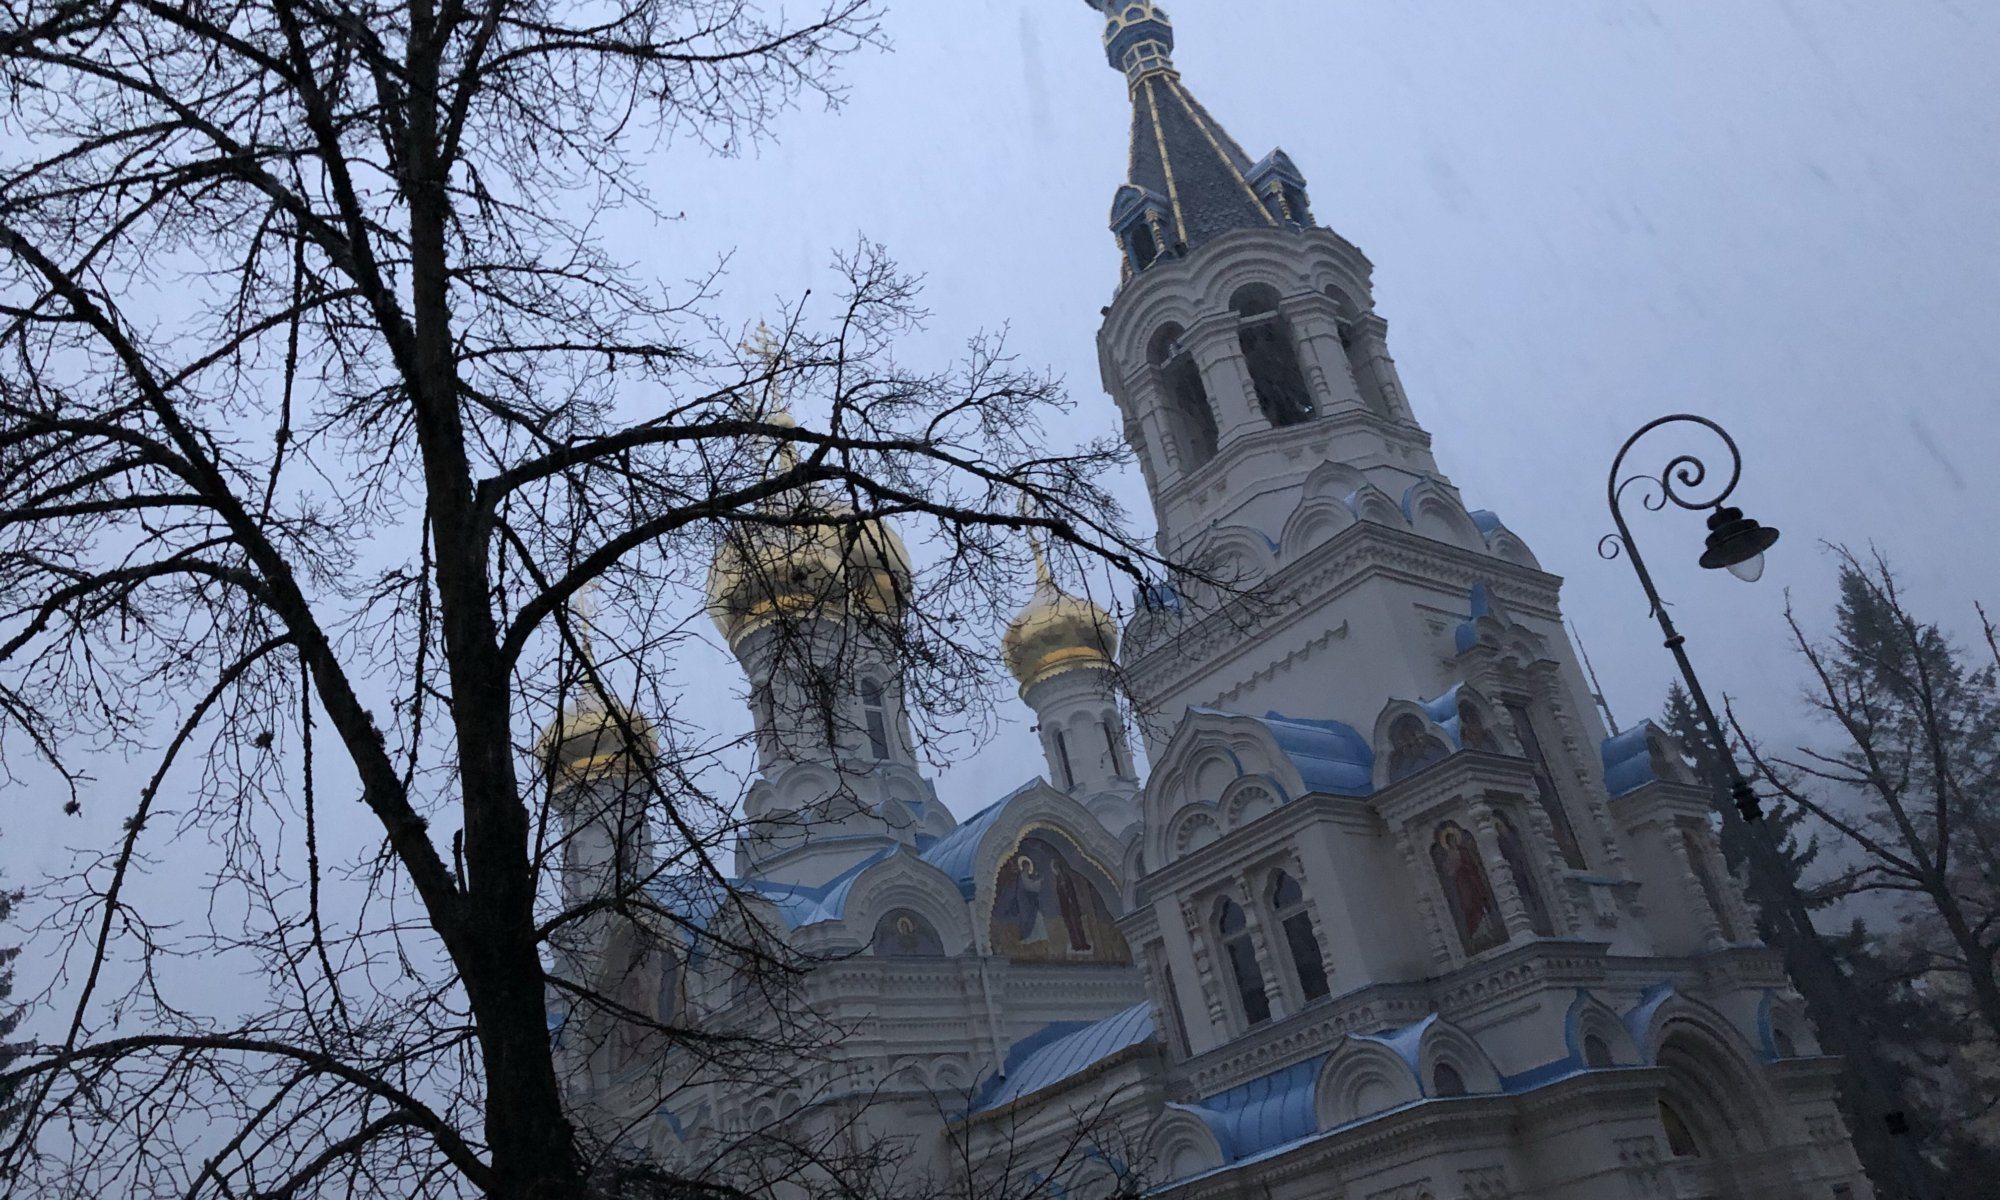 Chrám svatého Petra a Pavla, Karlovy Vary